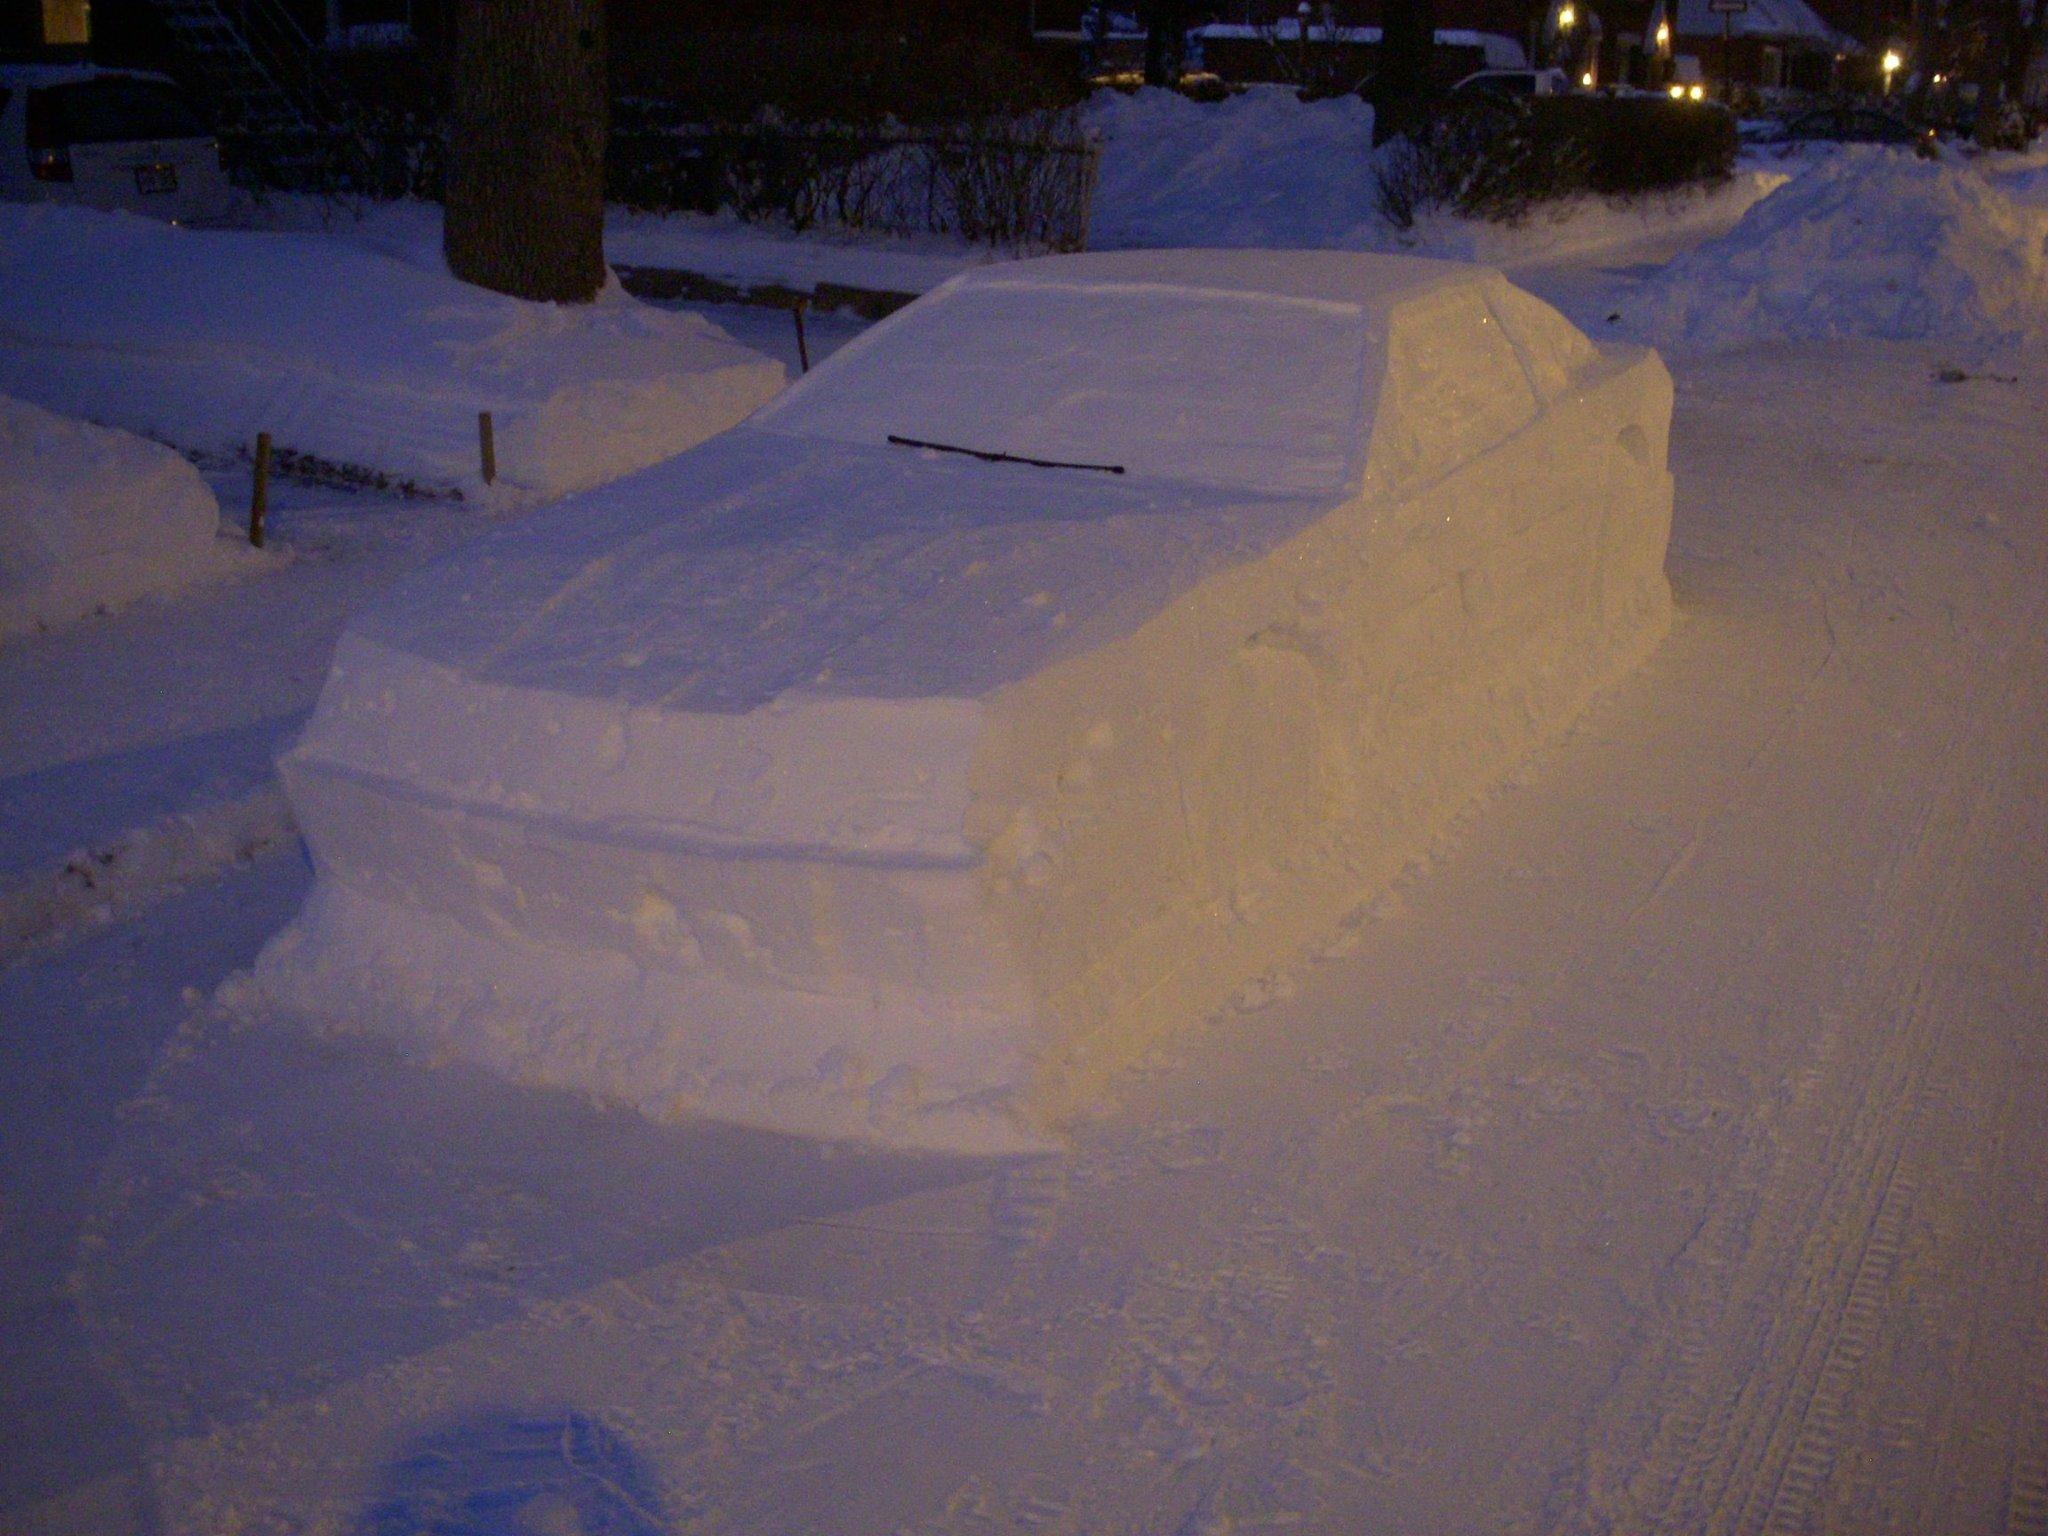 Toyota Supra snow (4)